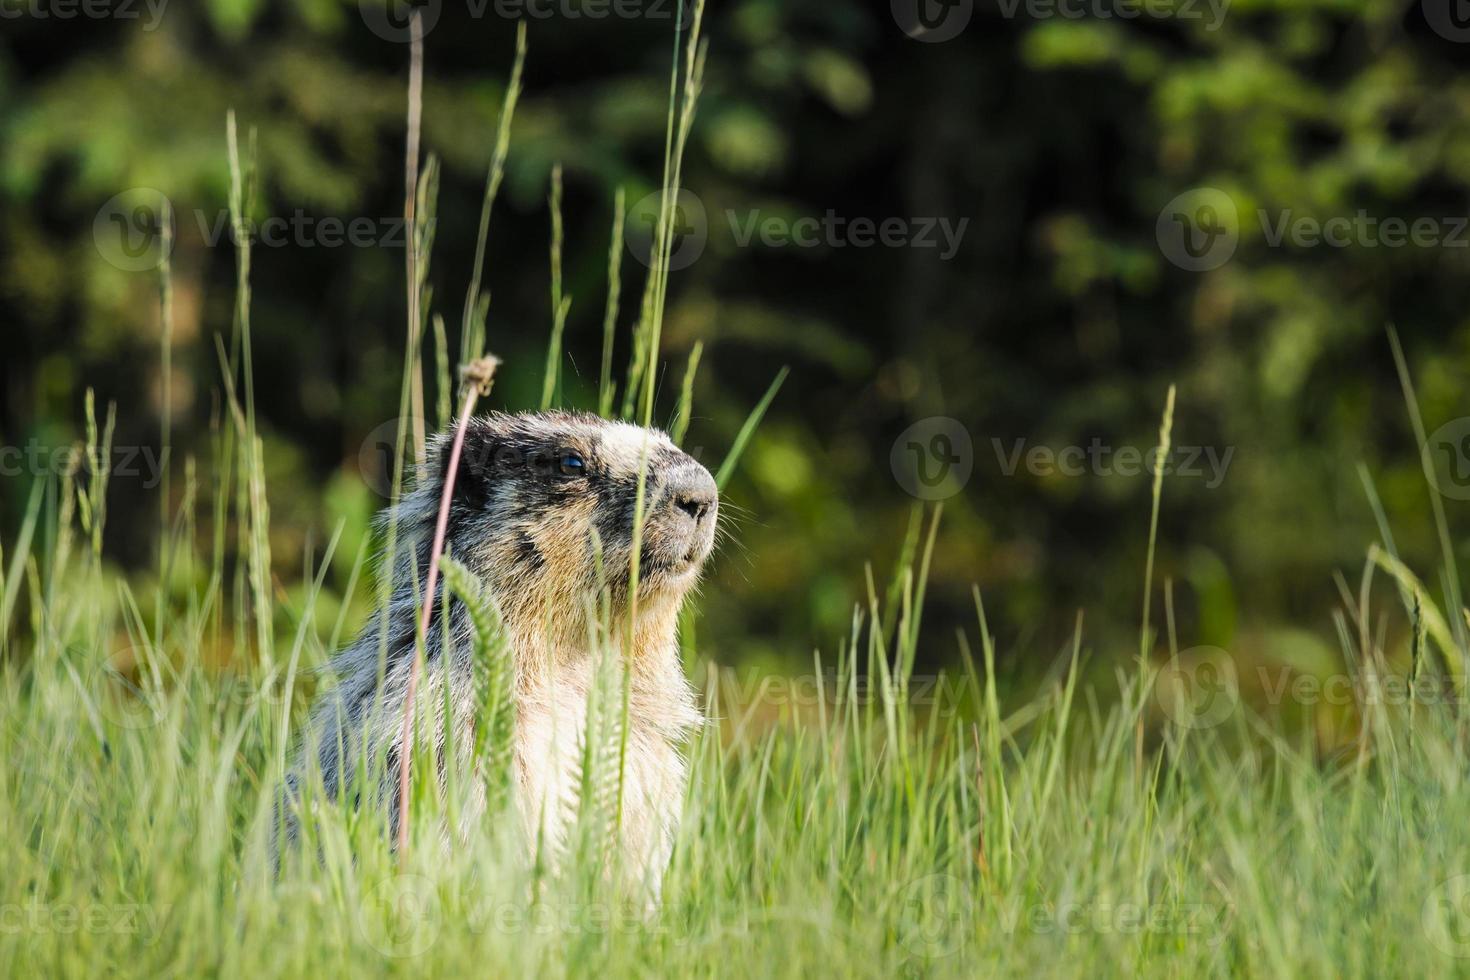 geelbuikmarmot (marmota flaviventris) foto